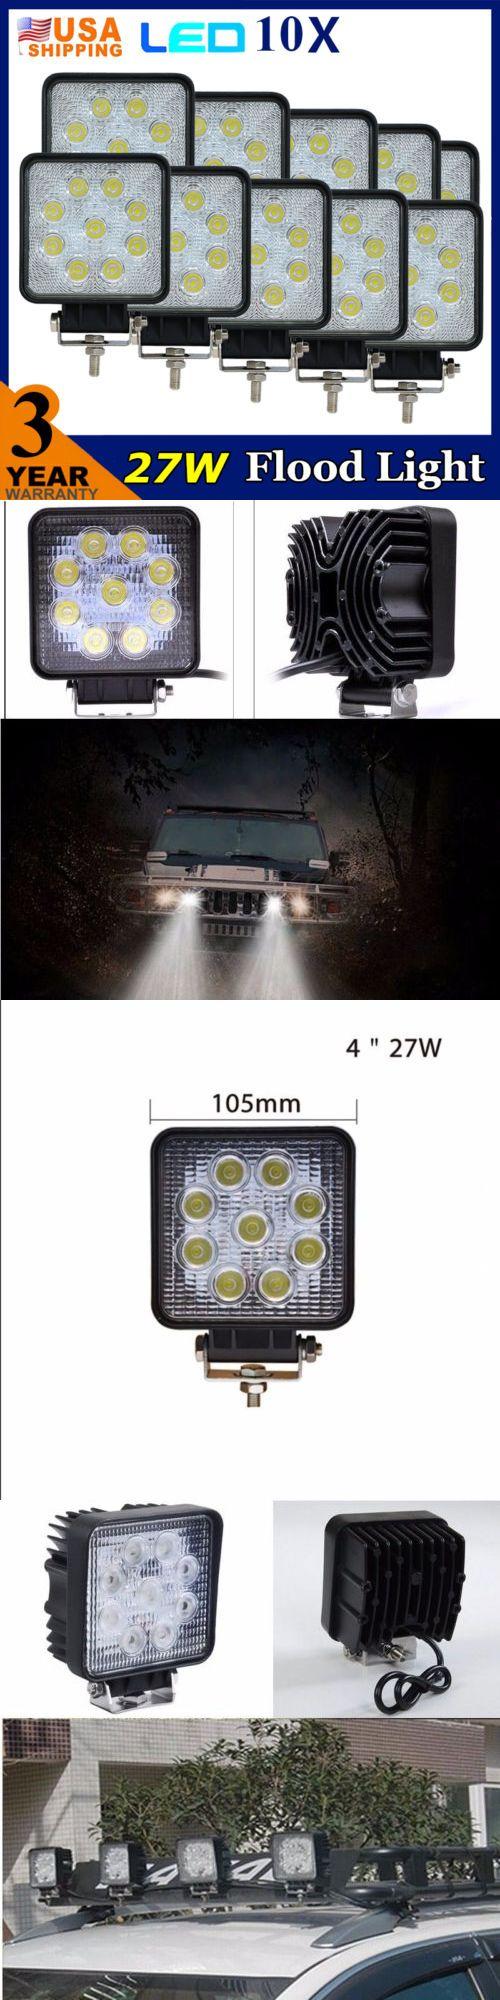 Car lighting 10 x 27w led work light flood beam offroad atv jeep suv 4wd